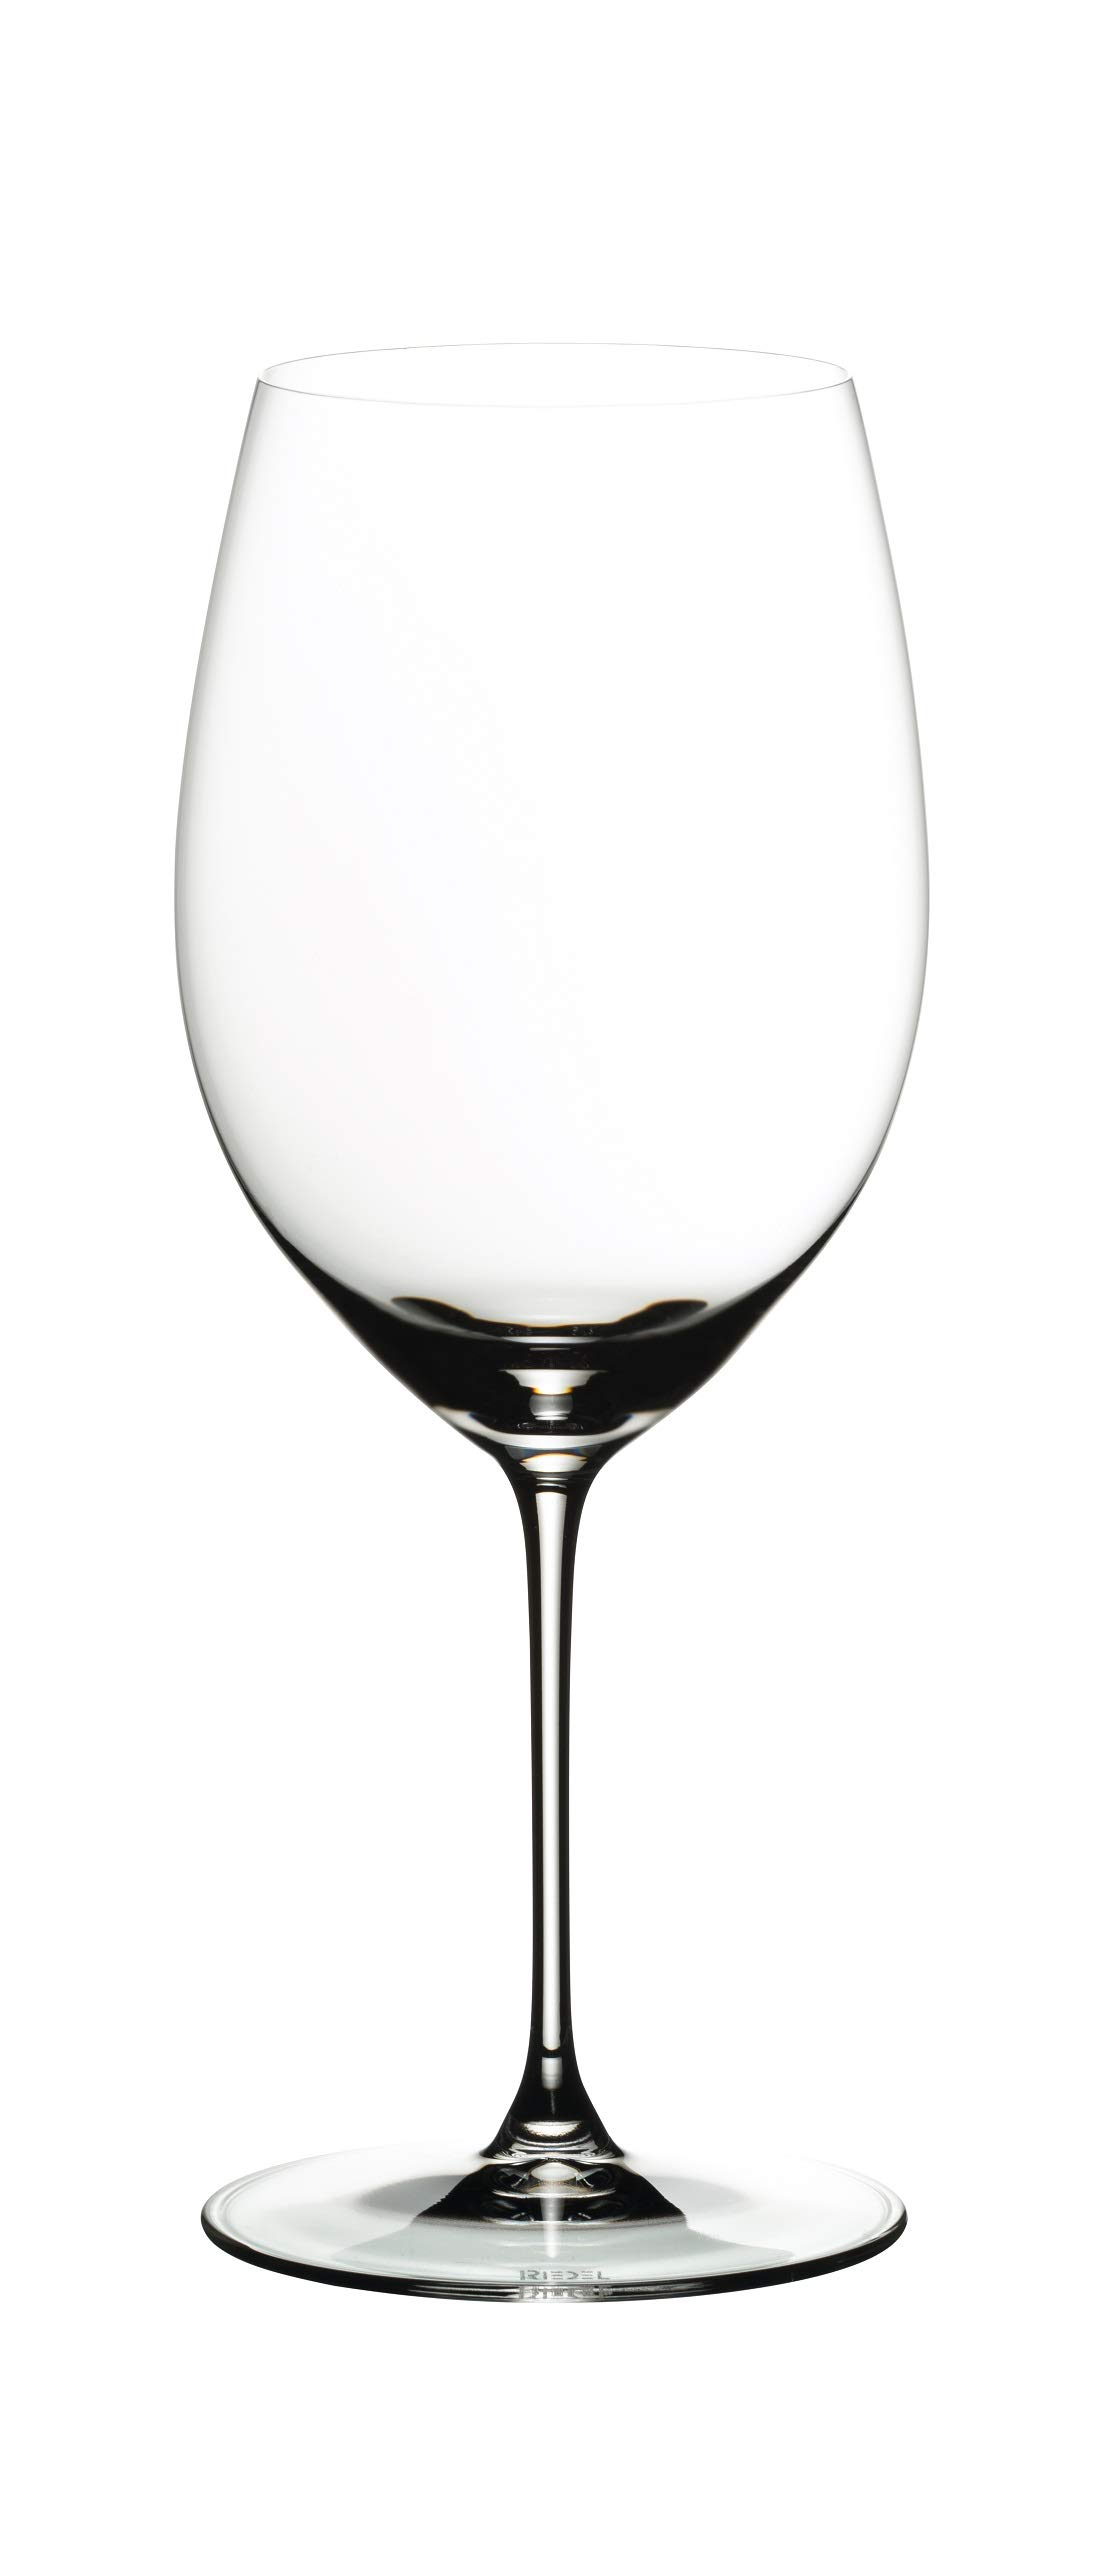 Riedel 6449/0 Veritas Cabernet/Merlot Wine Glasses, Set of 2, Clear by Riedel (Image #2)